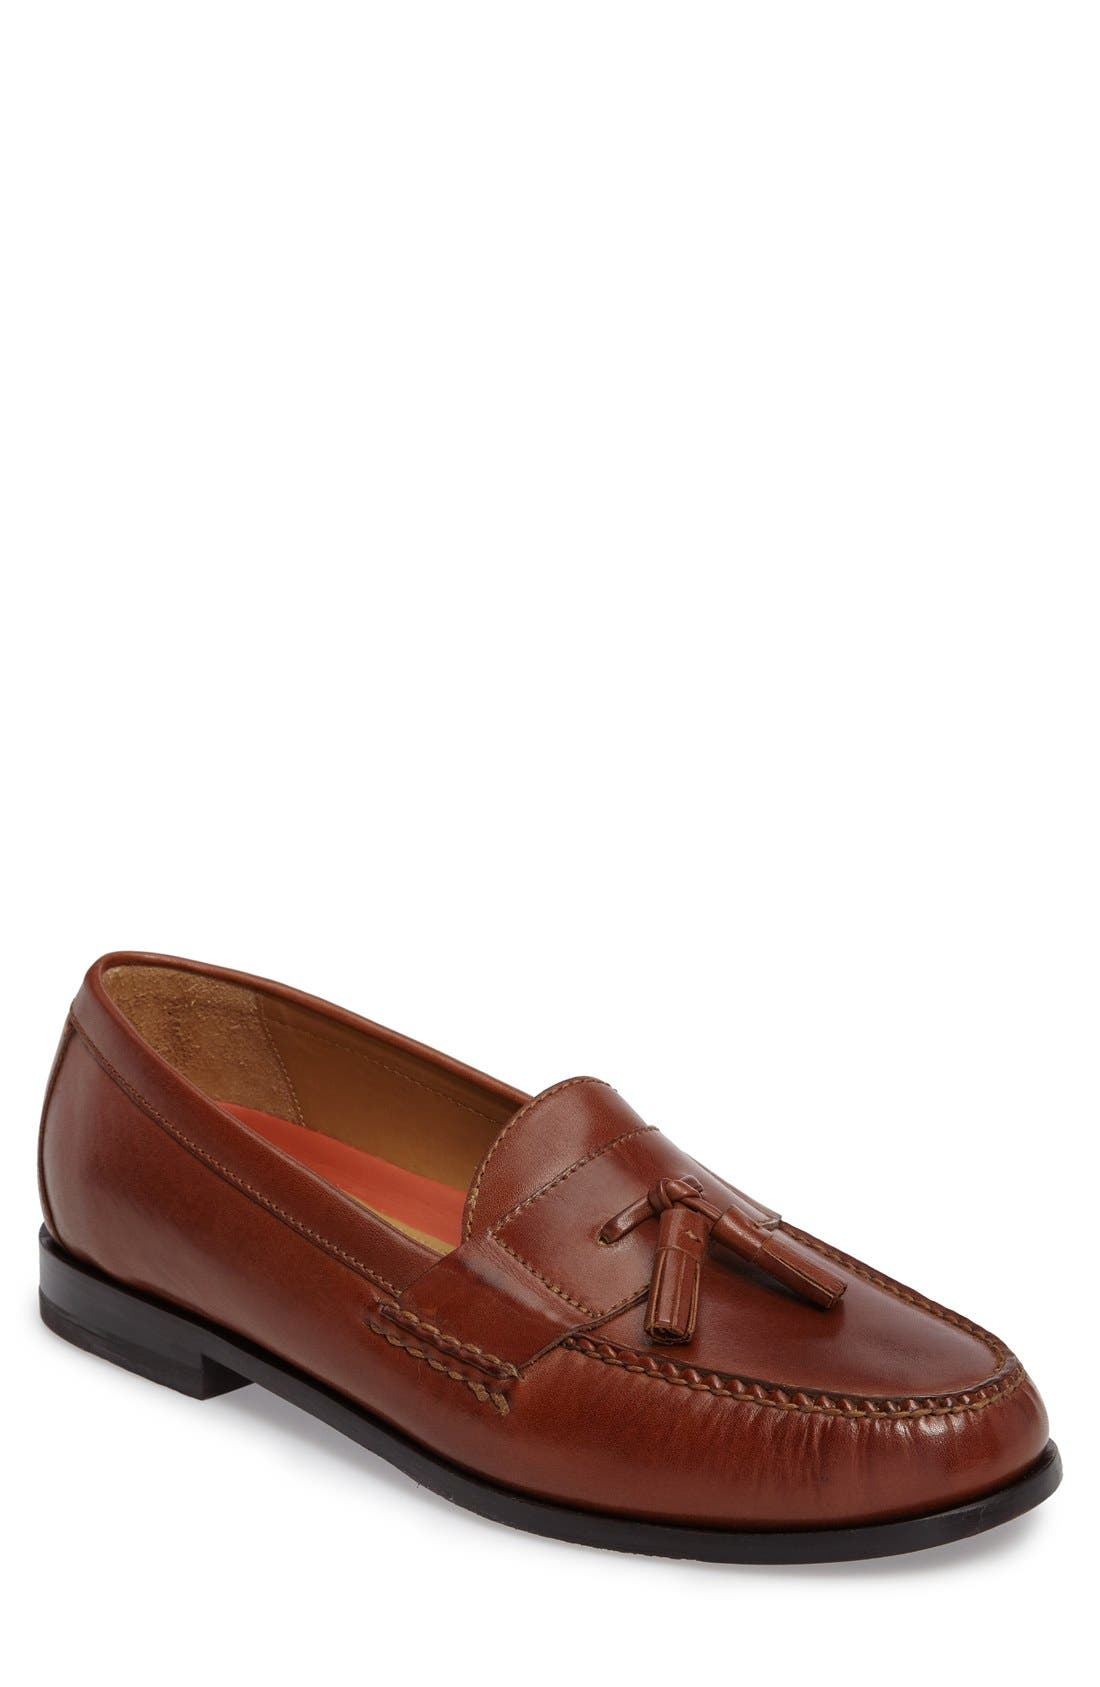 'Pinch Grand' Tassel Loafer,                             Main thumbnail 1, color,                             Papaya Leather